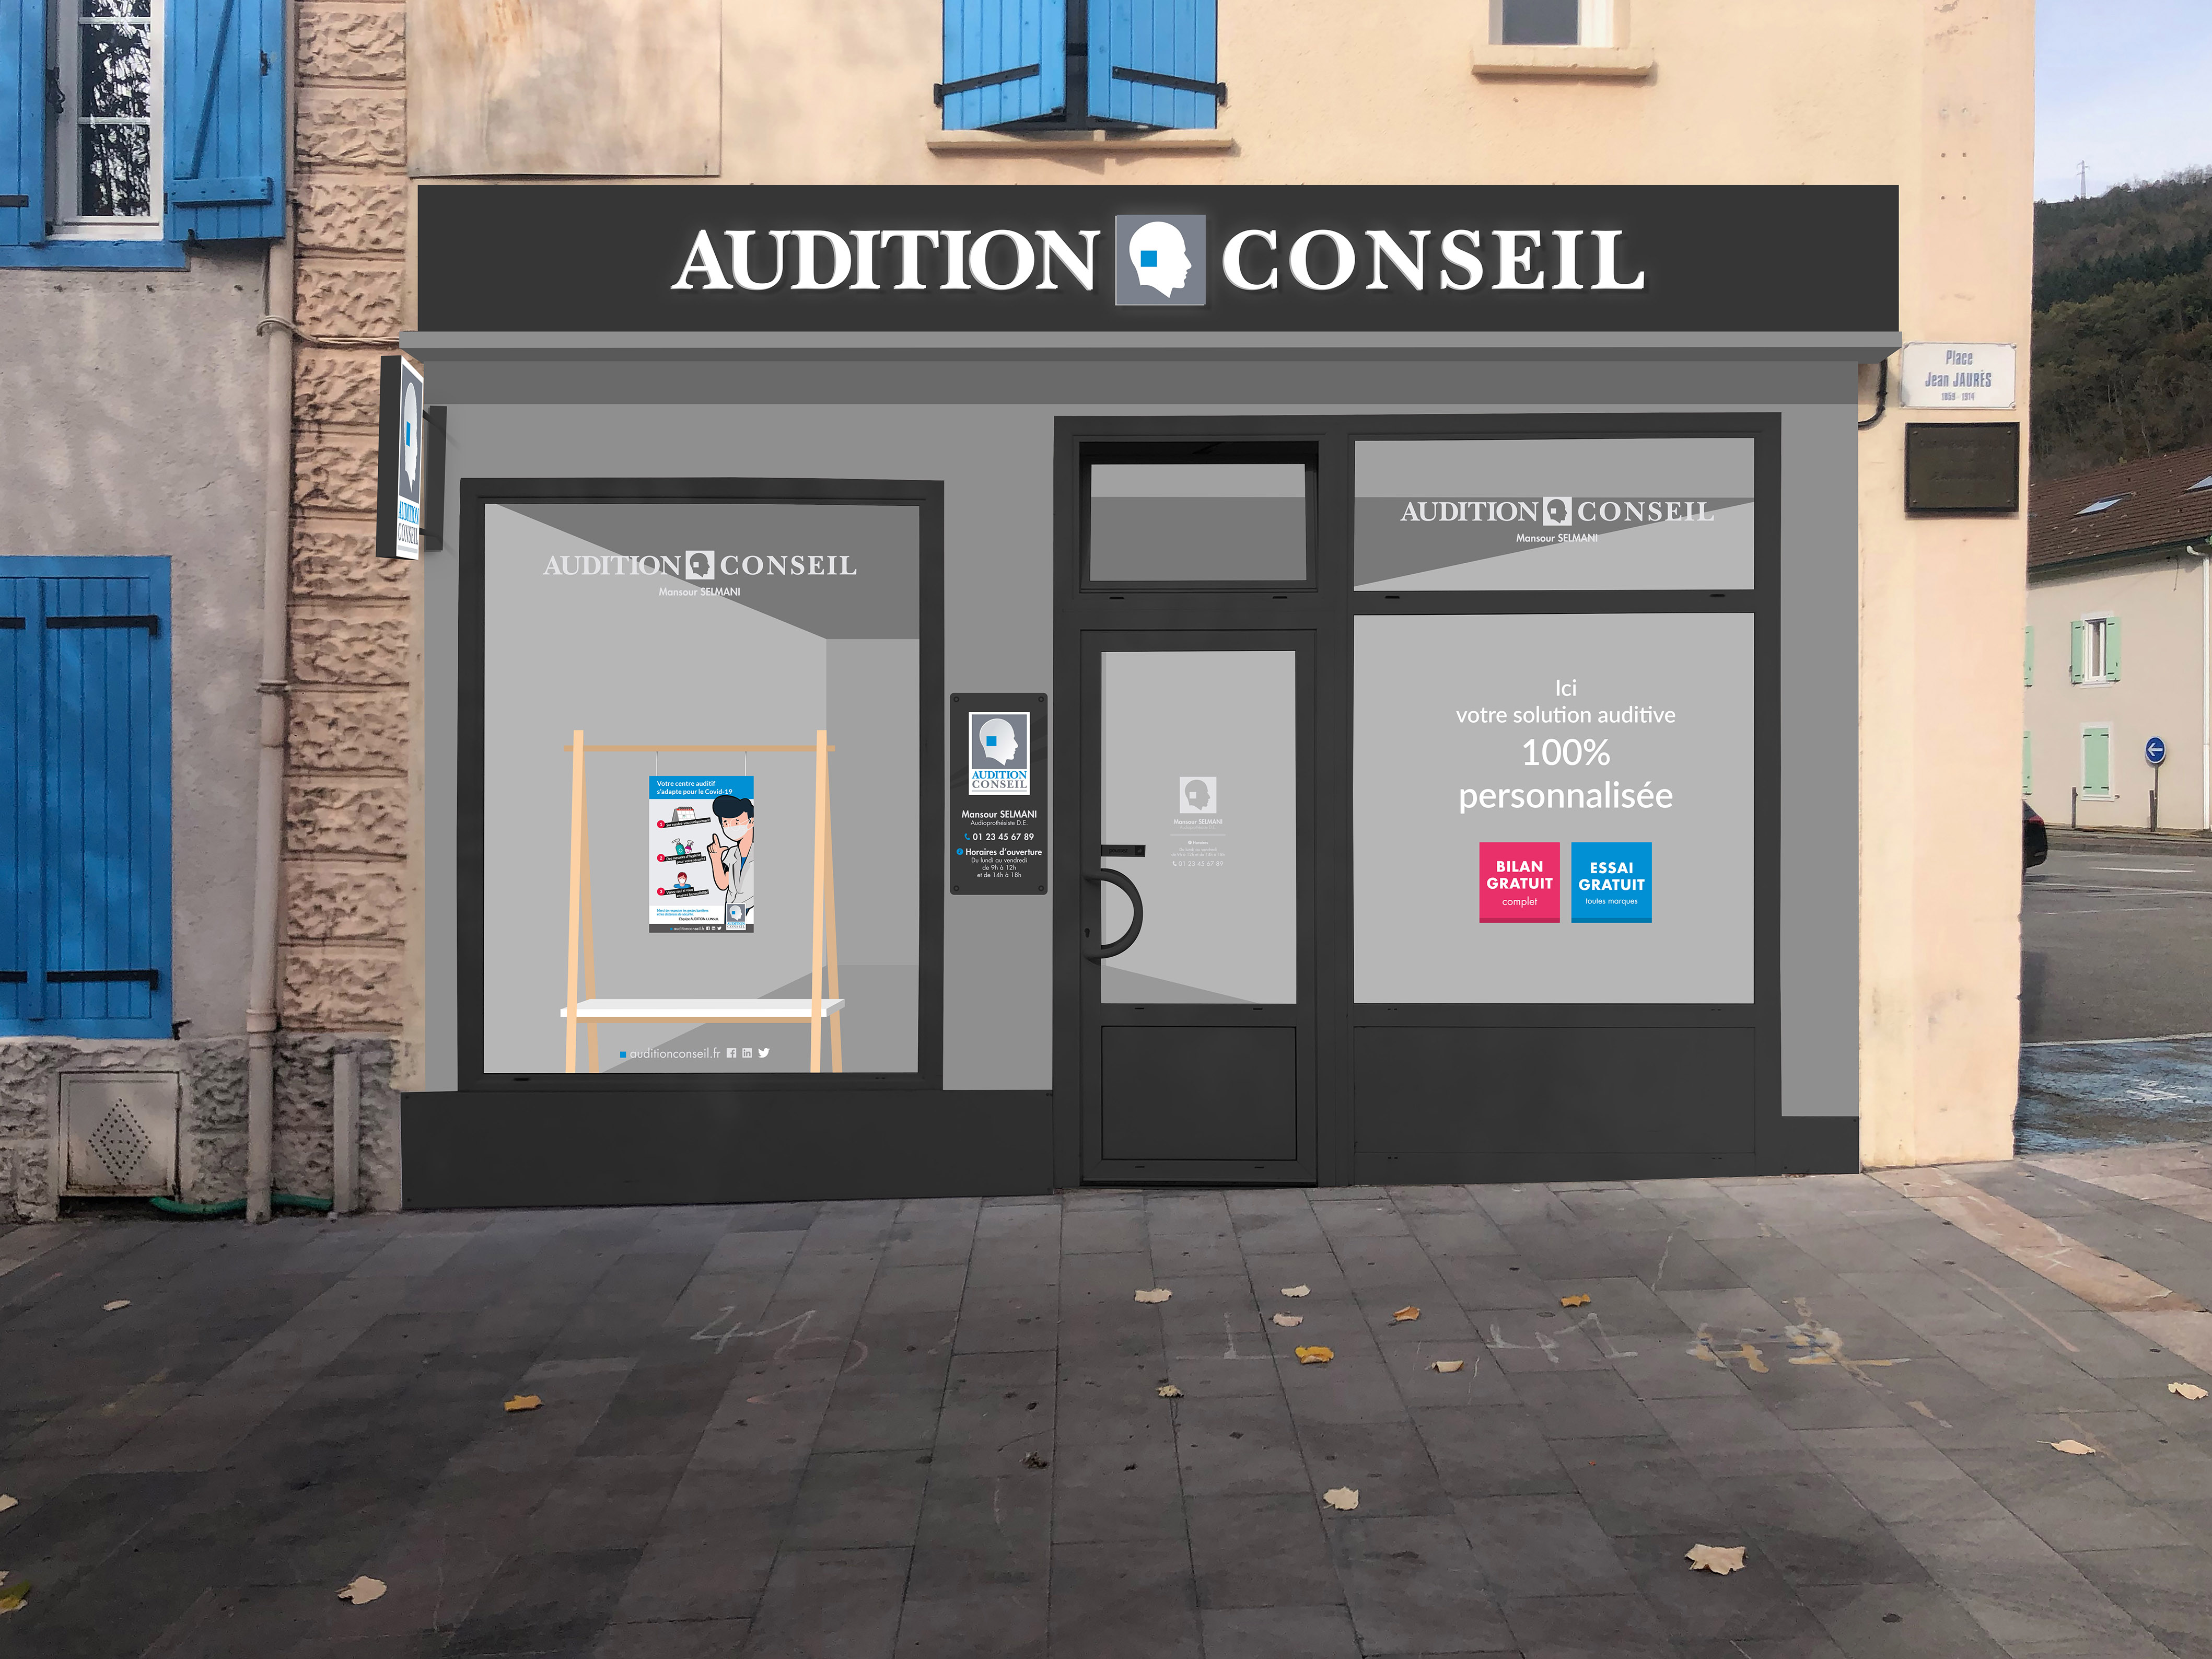 Audition Conseil Tarascon-sur-Ariège